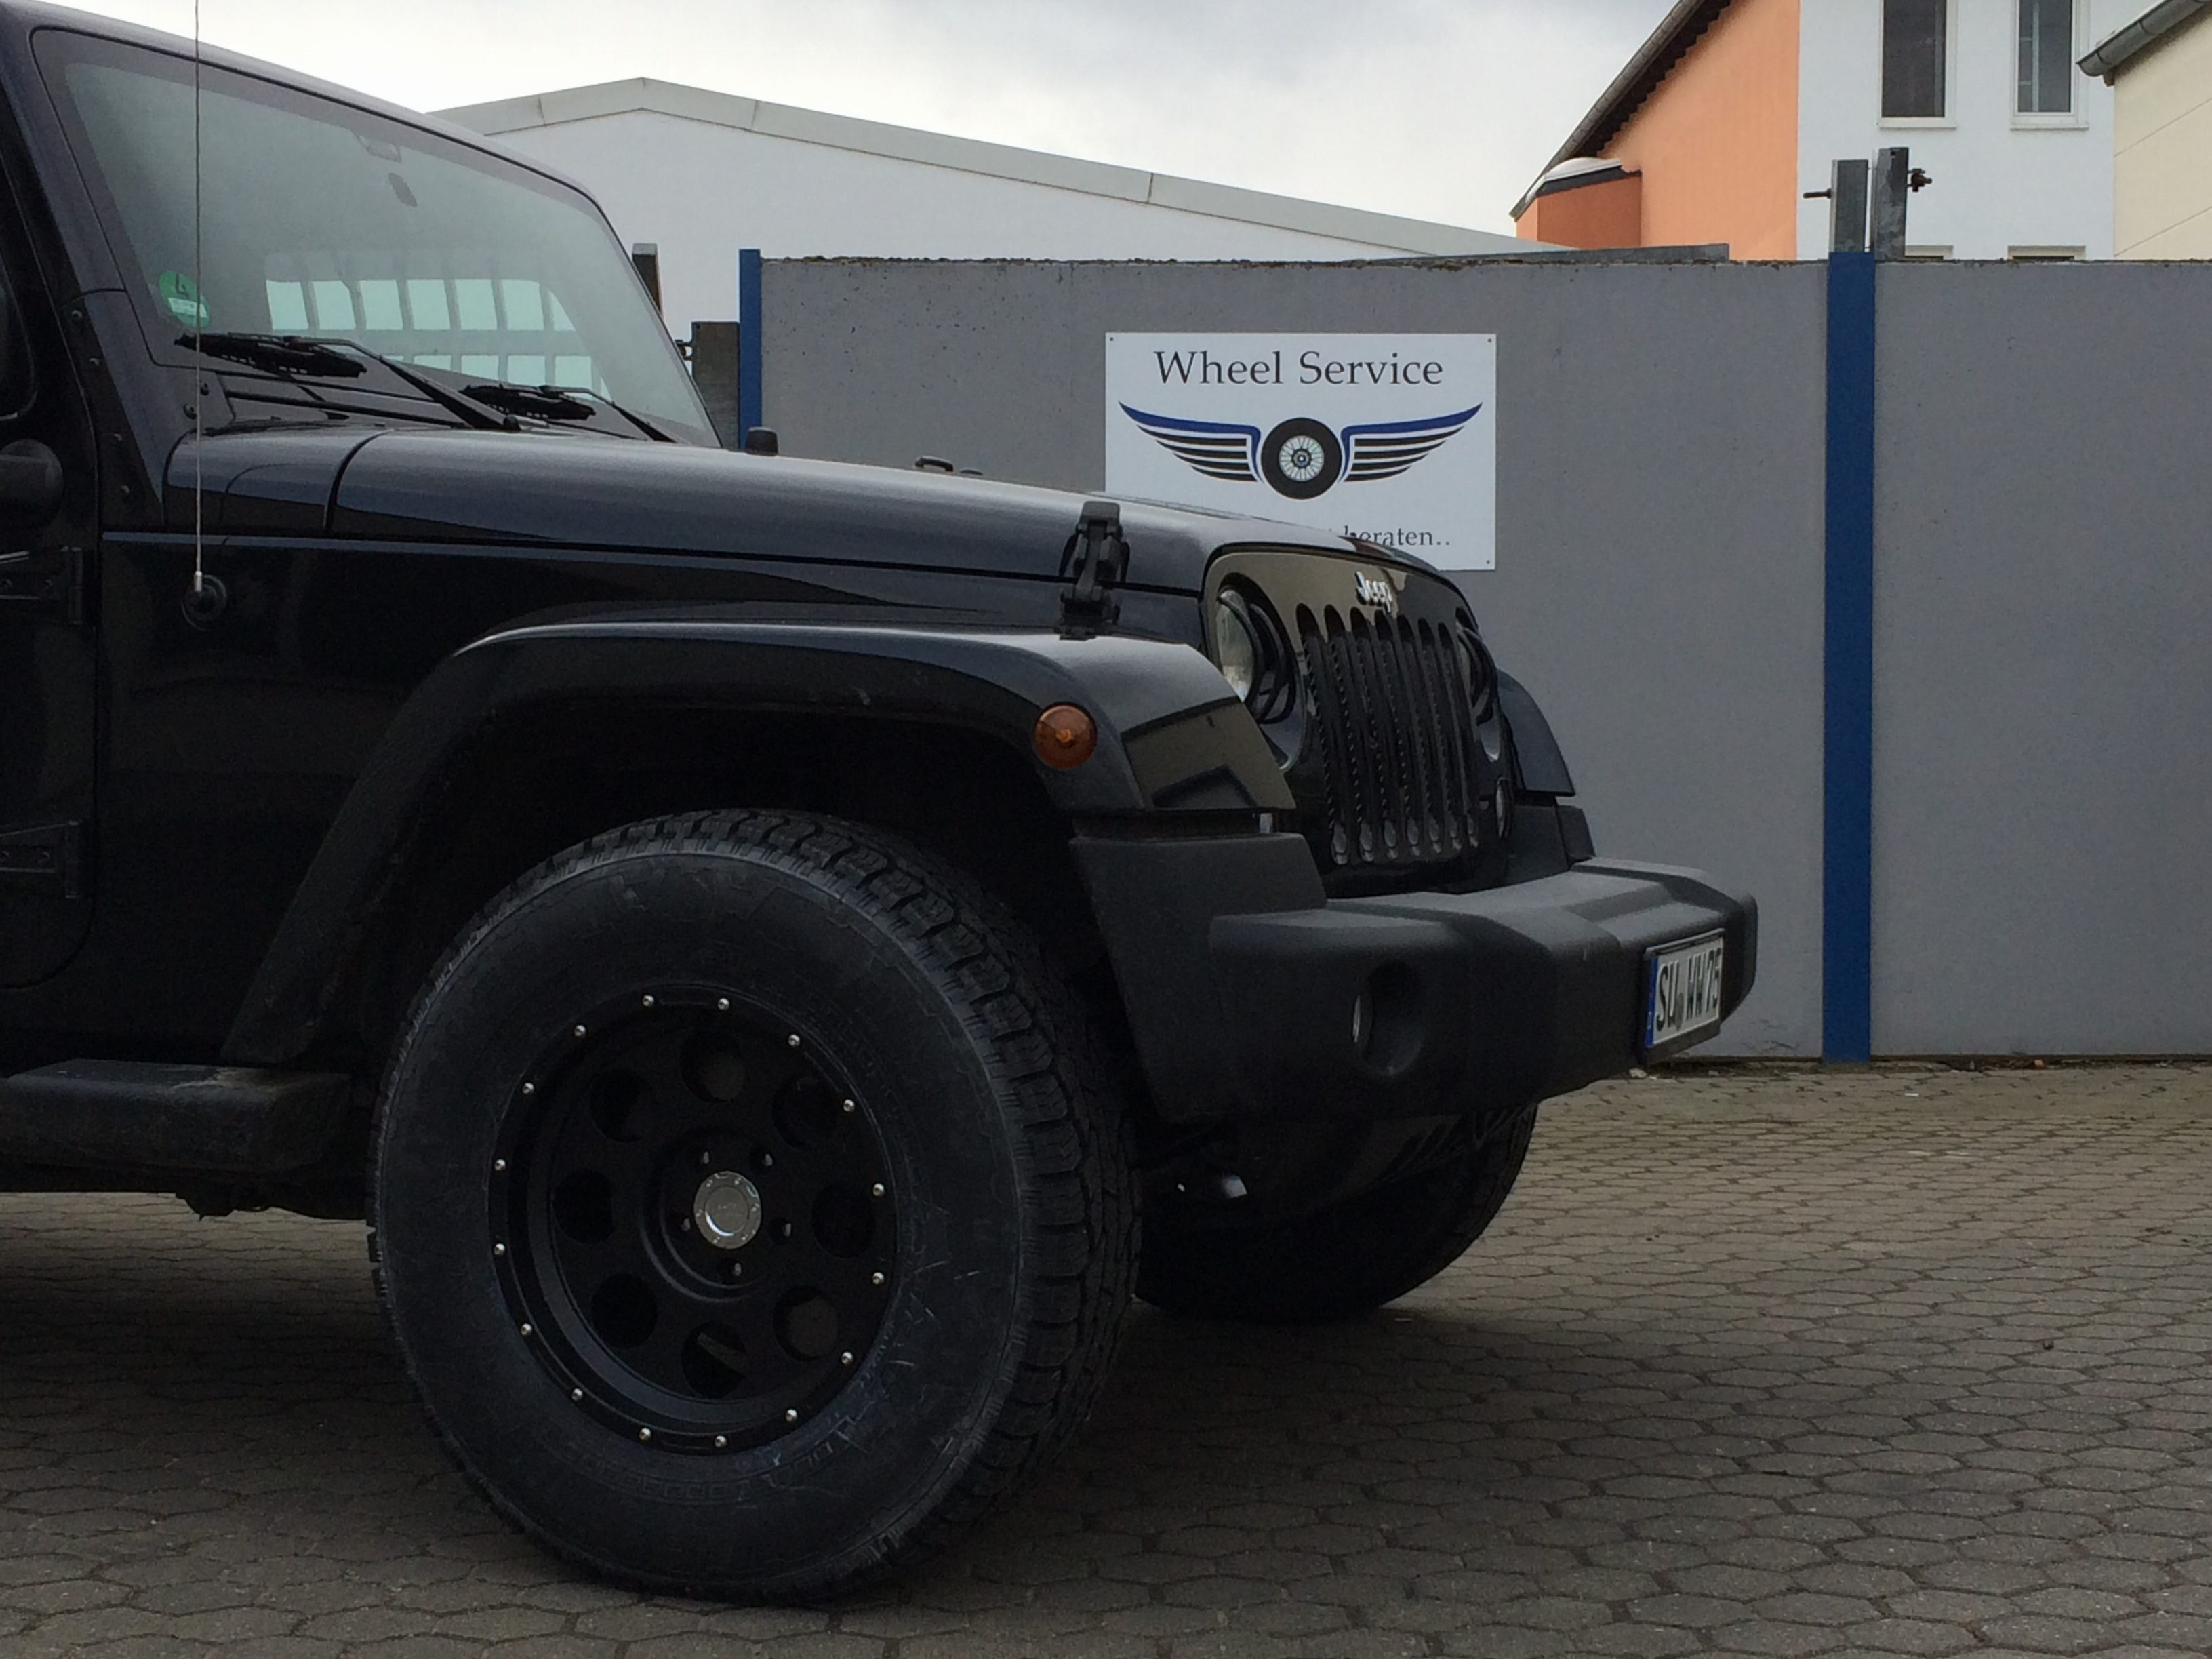 9x17 ET 16 Duratrail on Jeep Wrangler